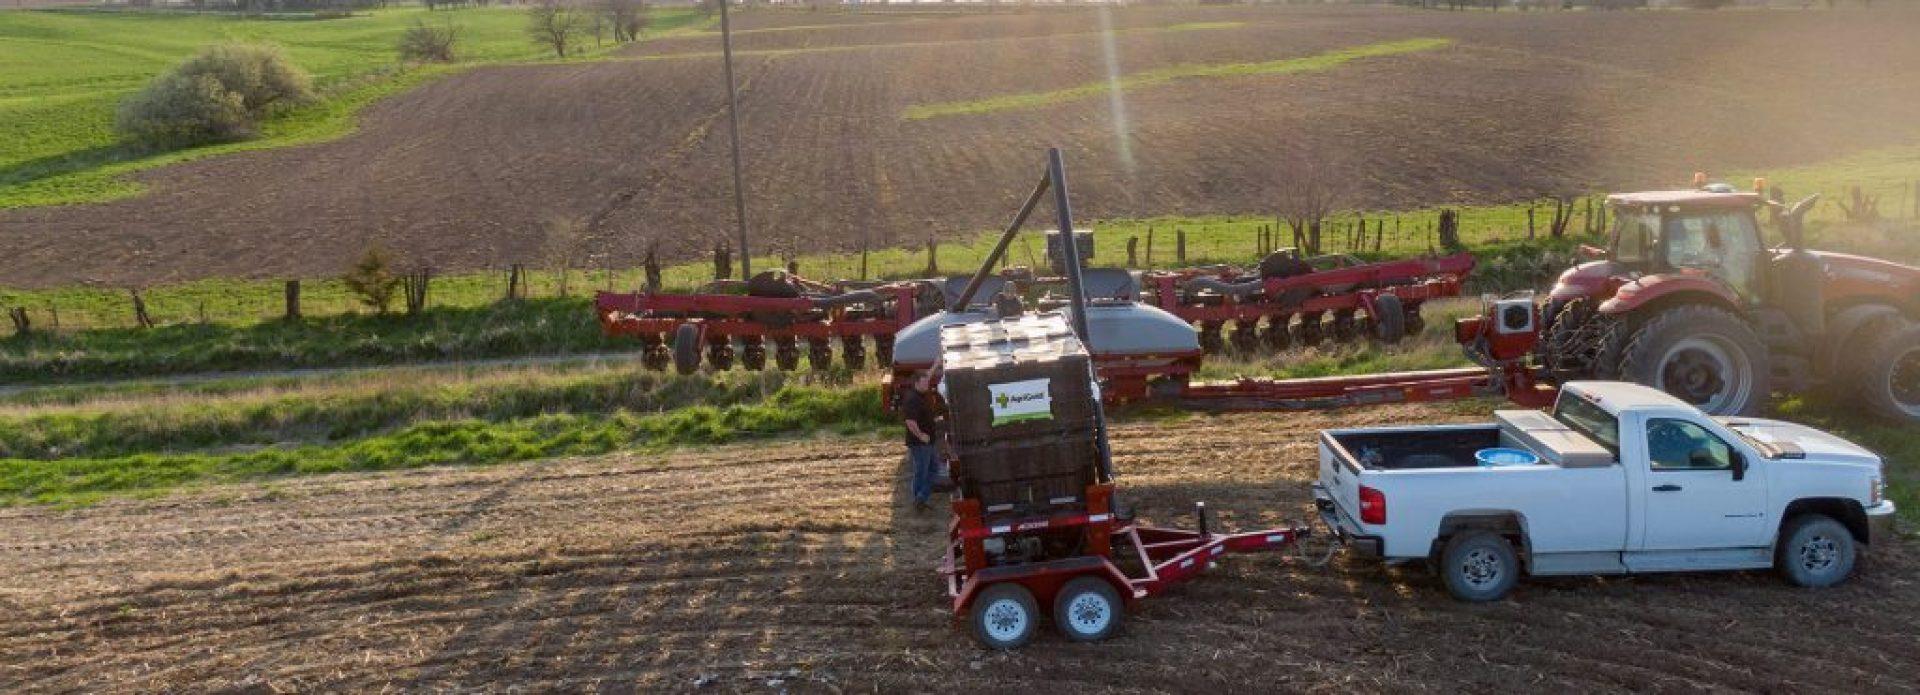 Eldon-C-Stutsman-Inc-Agronomy-Spring (5)